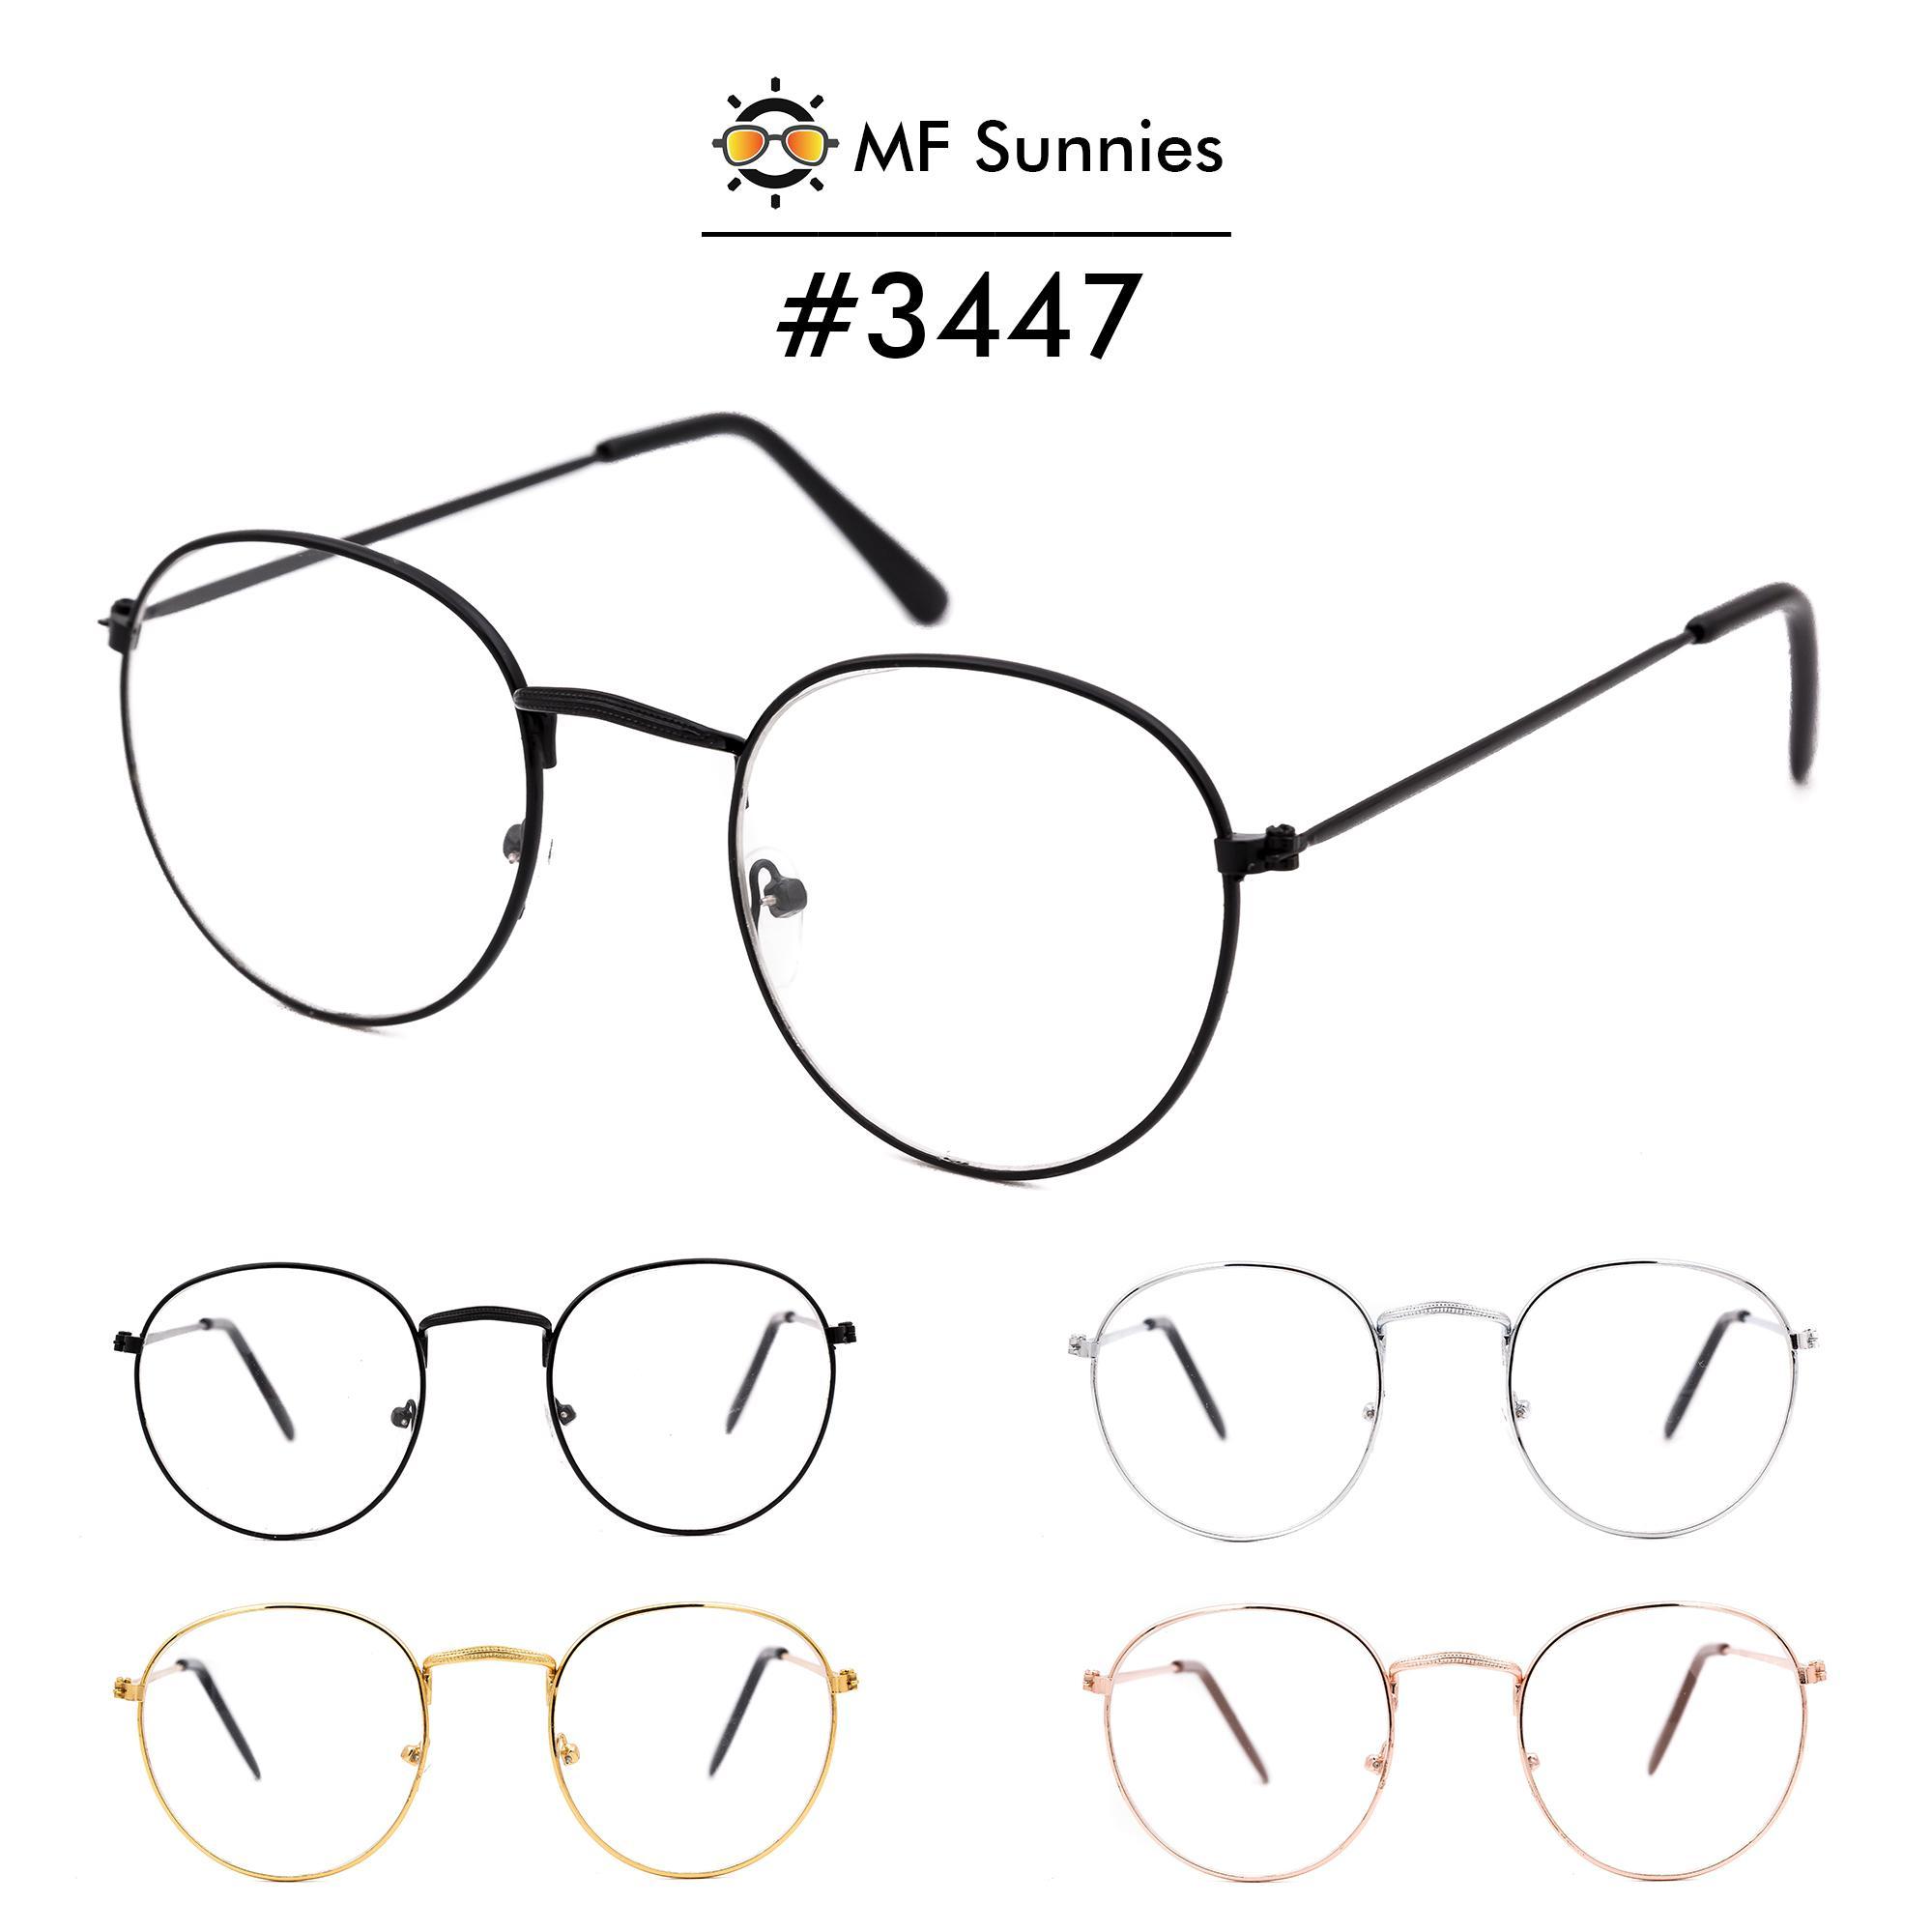 35714e5e95f MFSunnies Anti Radiation  Metal Optical Frame korean fashion eyewear metal  hinges  3447C